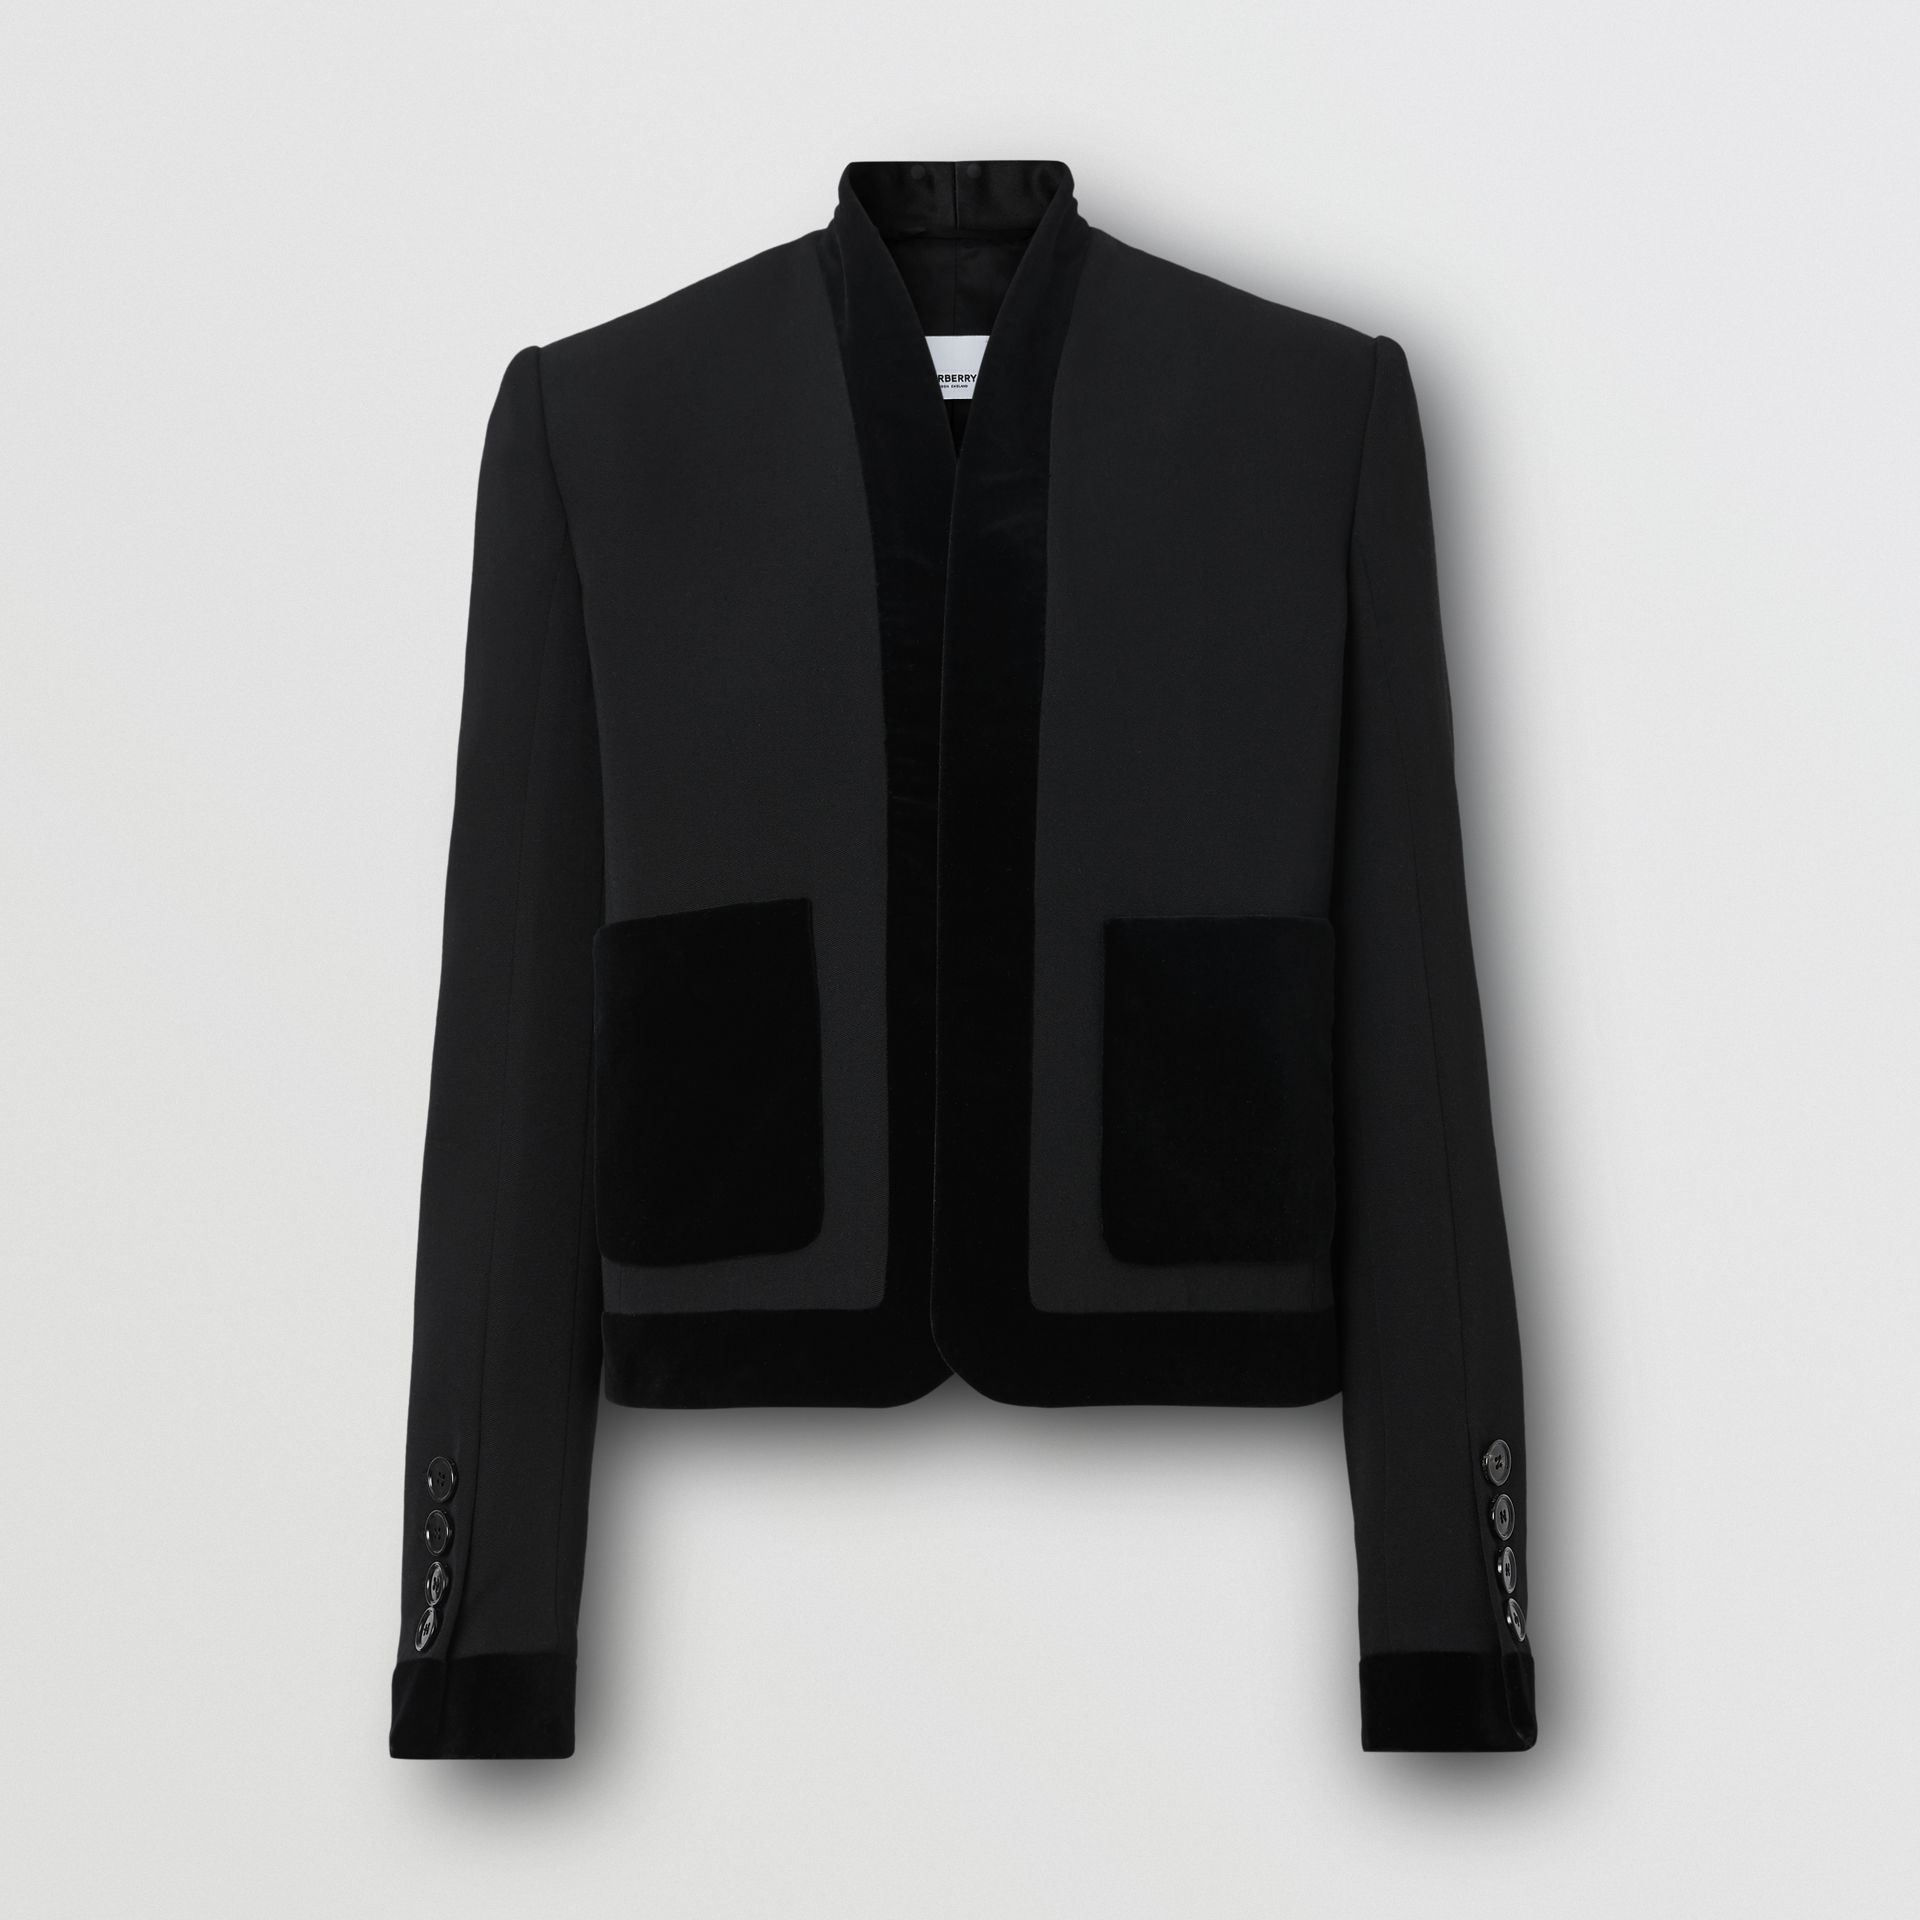 Velvet Detail Wool Tailored Jacket in Black - Women | Burberry - gallery image 3